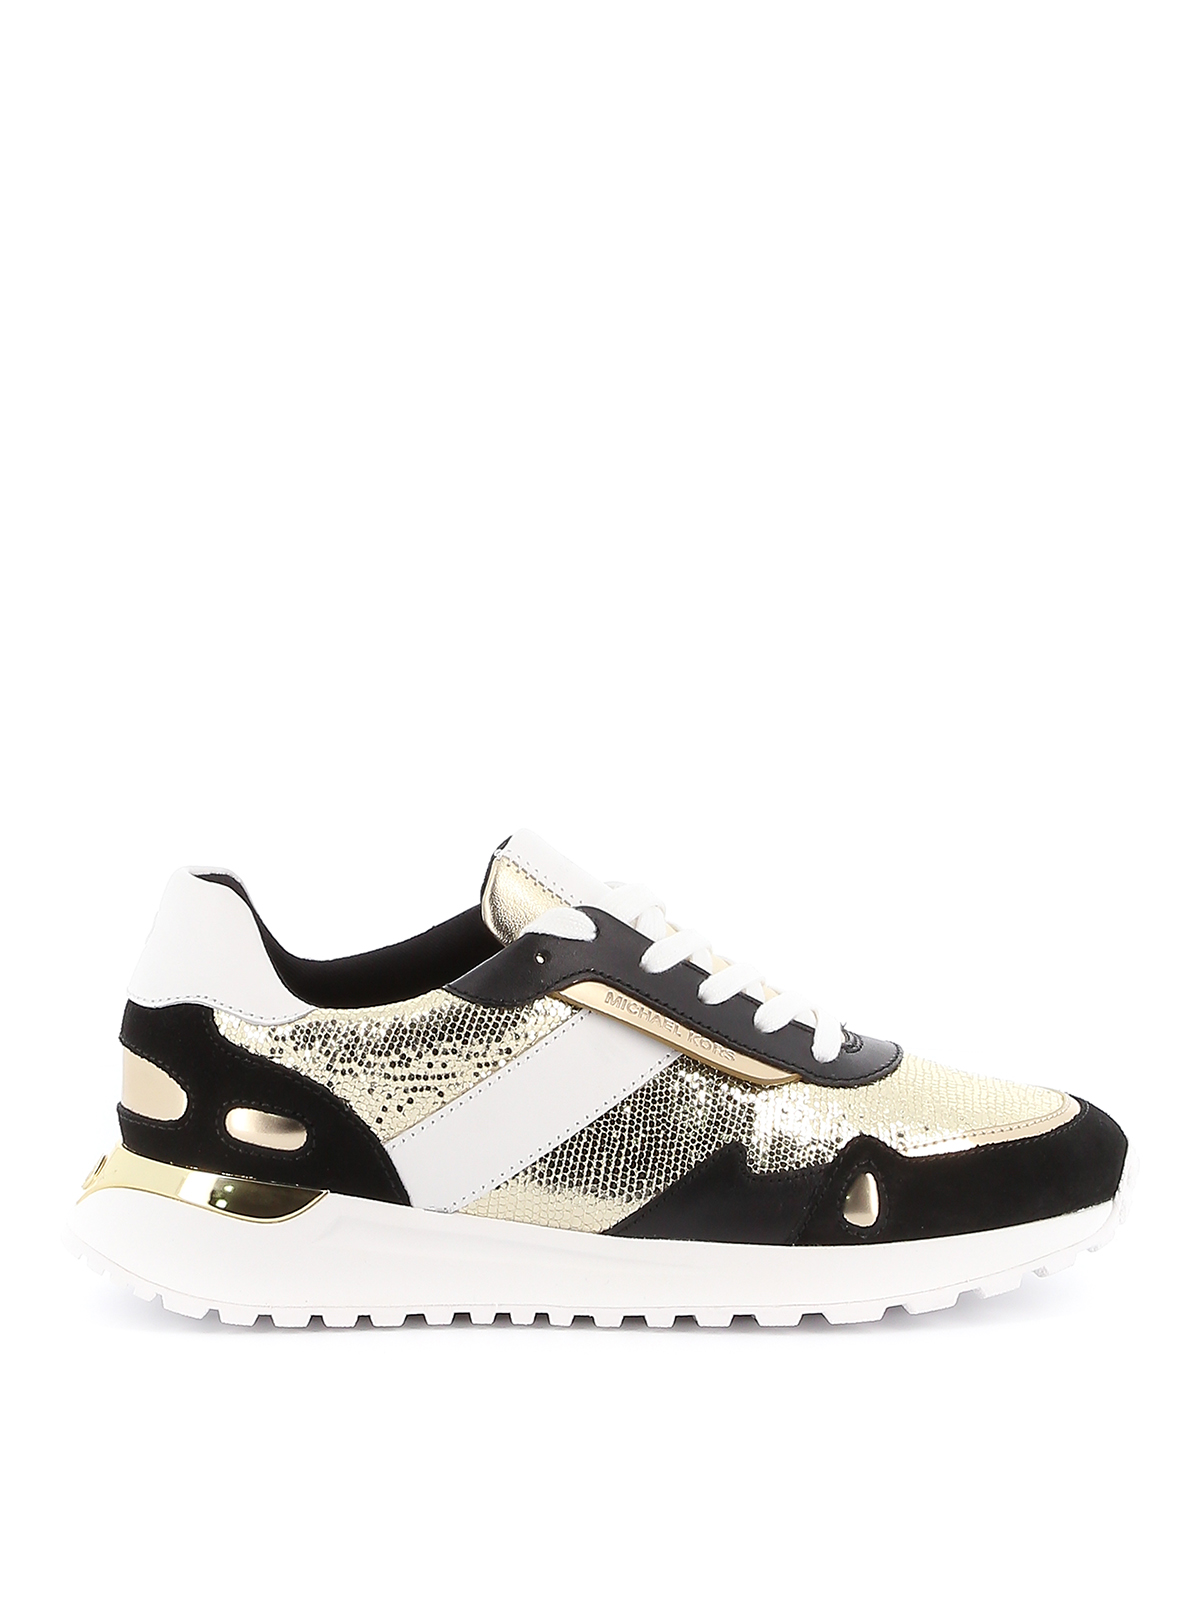 Michael Kors - Monroe sneakers